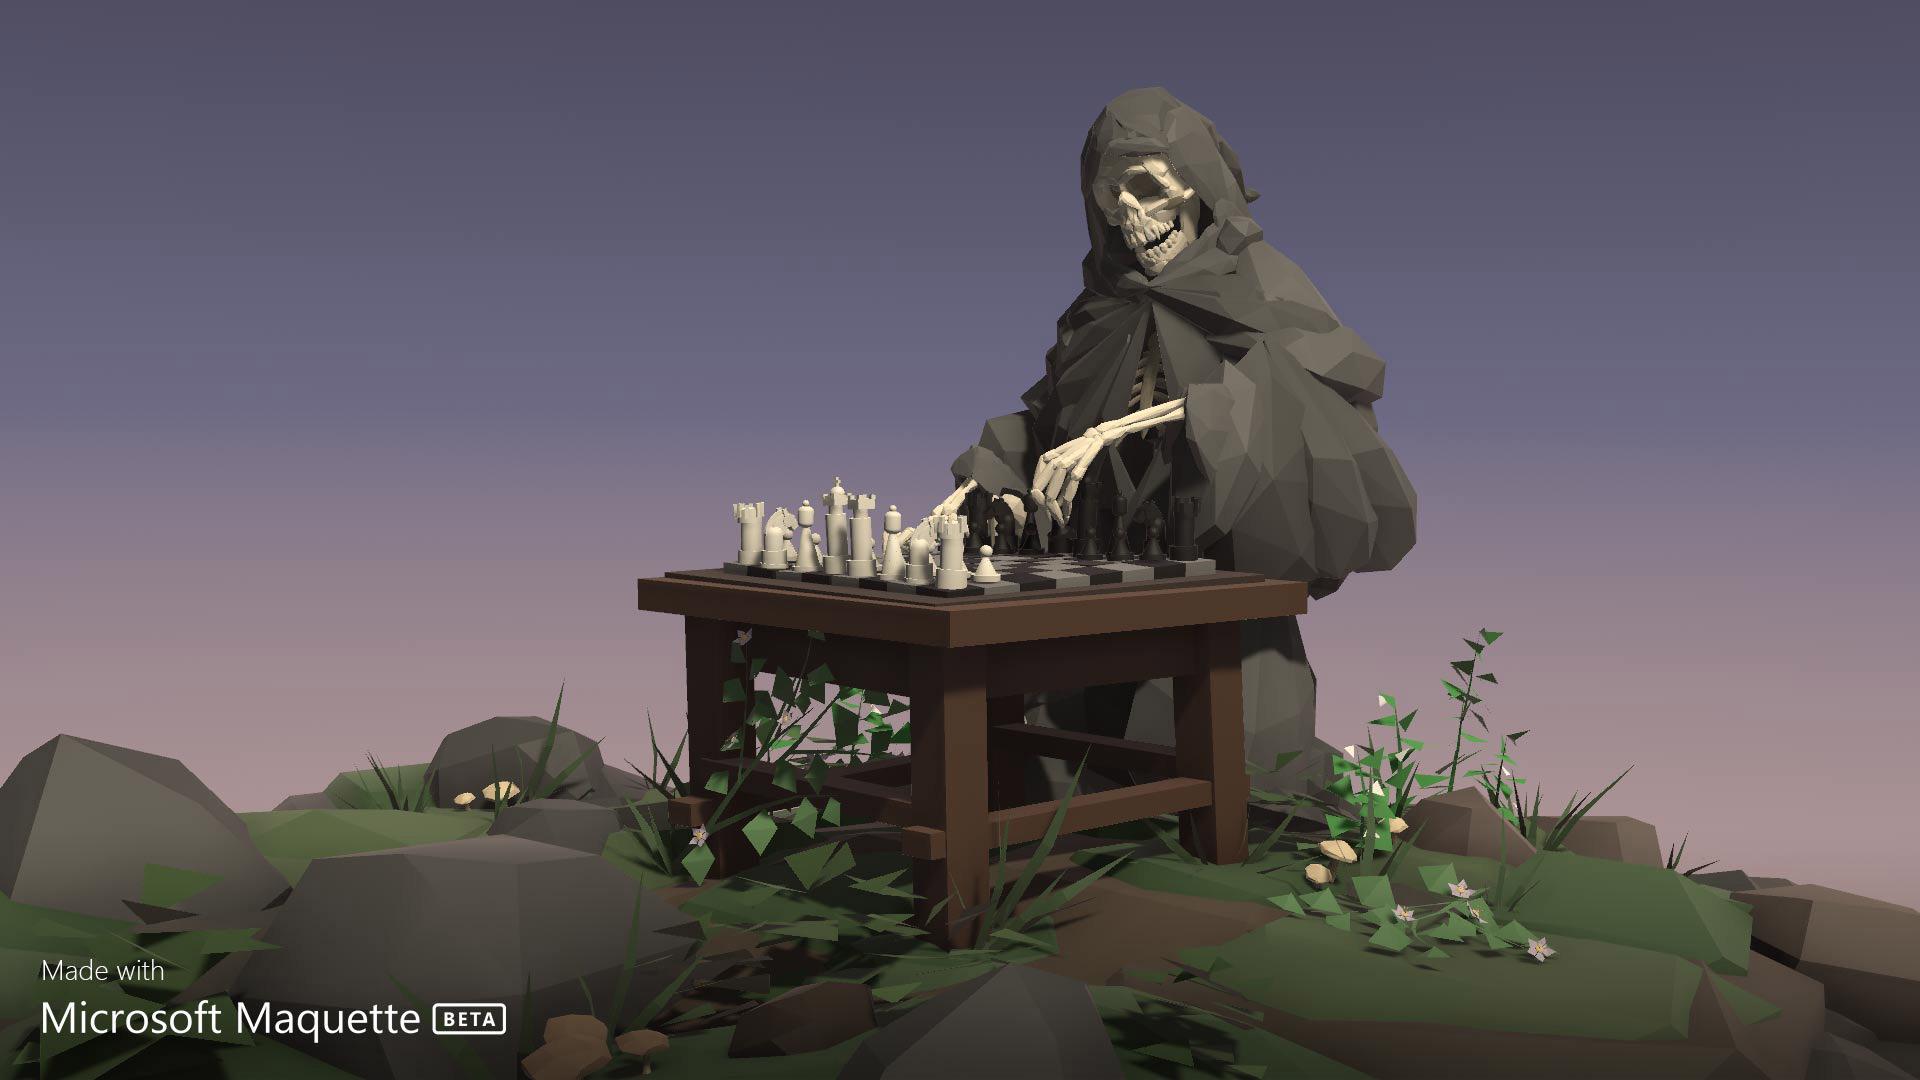 maquette game wallpaper 73689